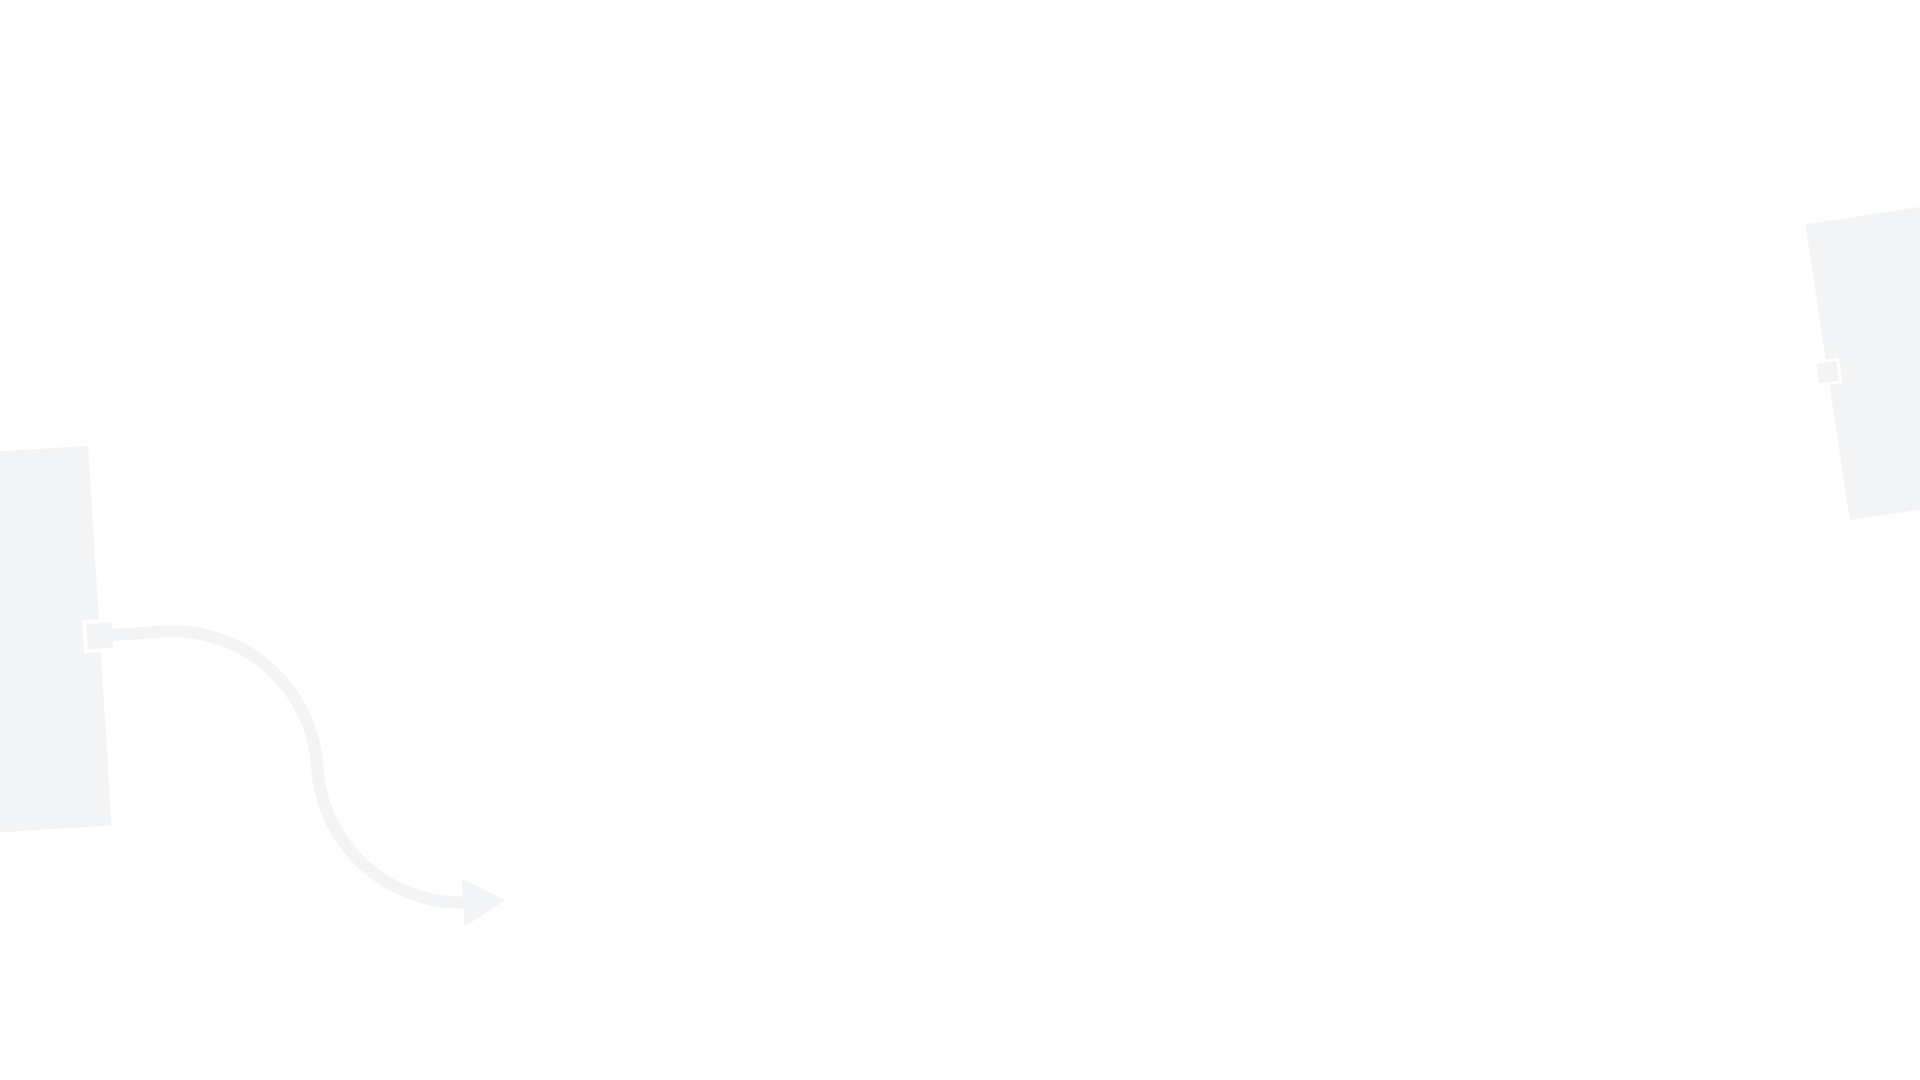 BG_Texture_arrows_v7